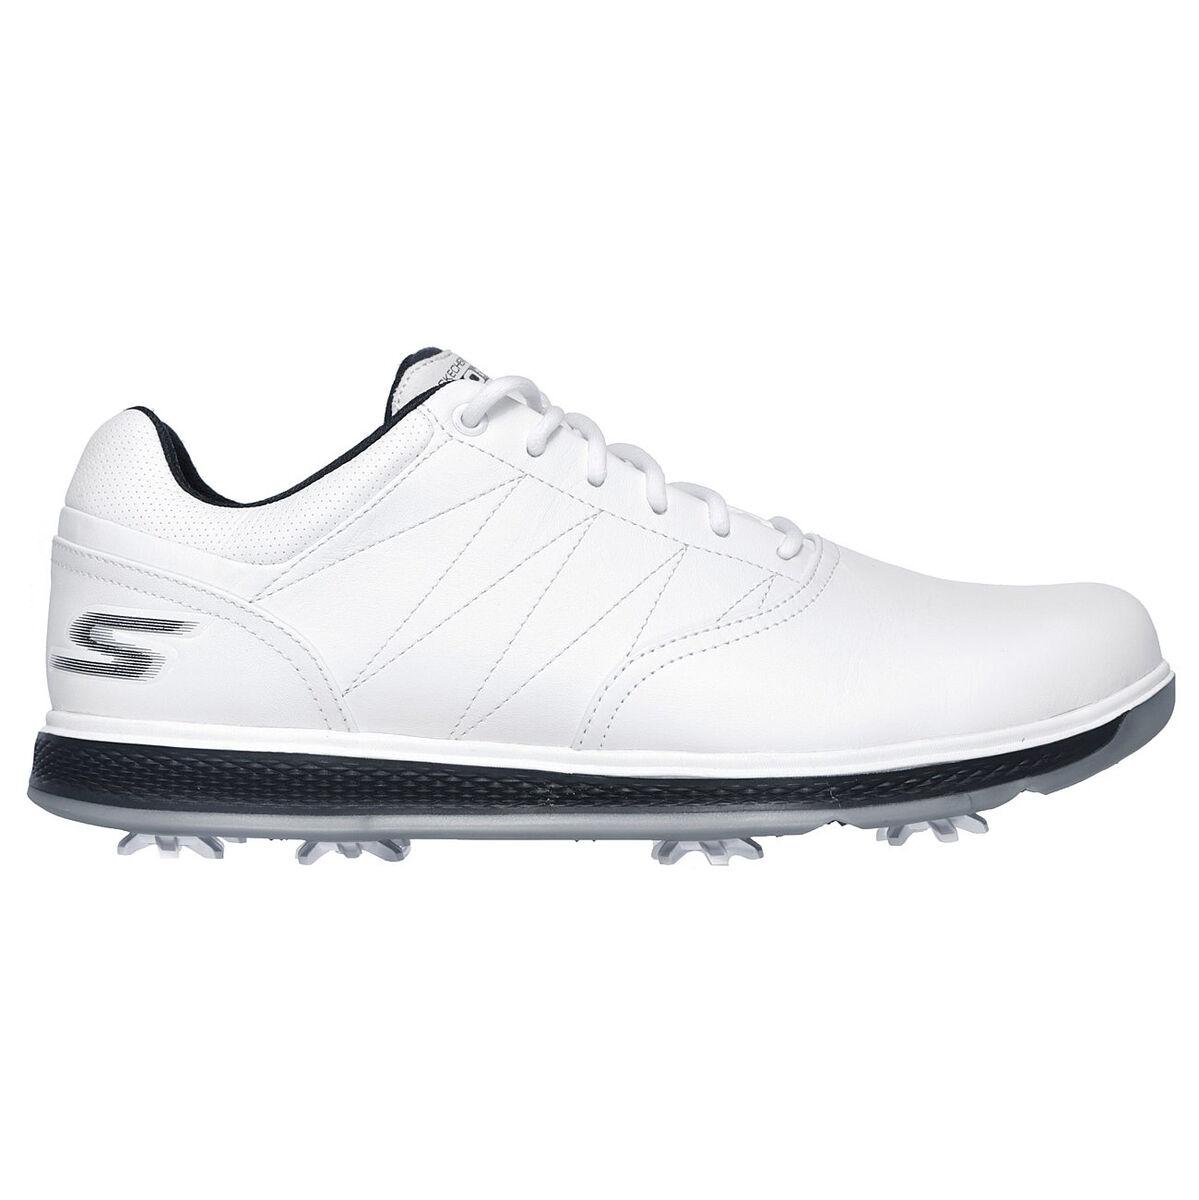 5bedf06e0f Skechers GO GOLF Pro V.3 Men's Golf Shoe - White/Navy   PGA TOUR ...